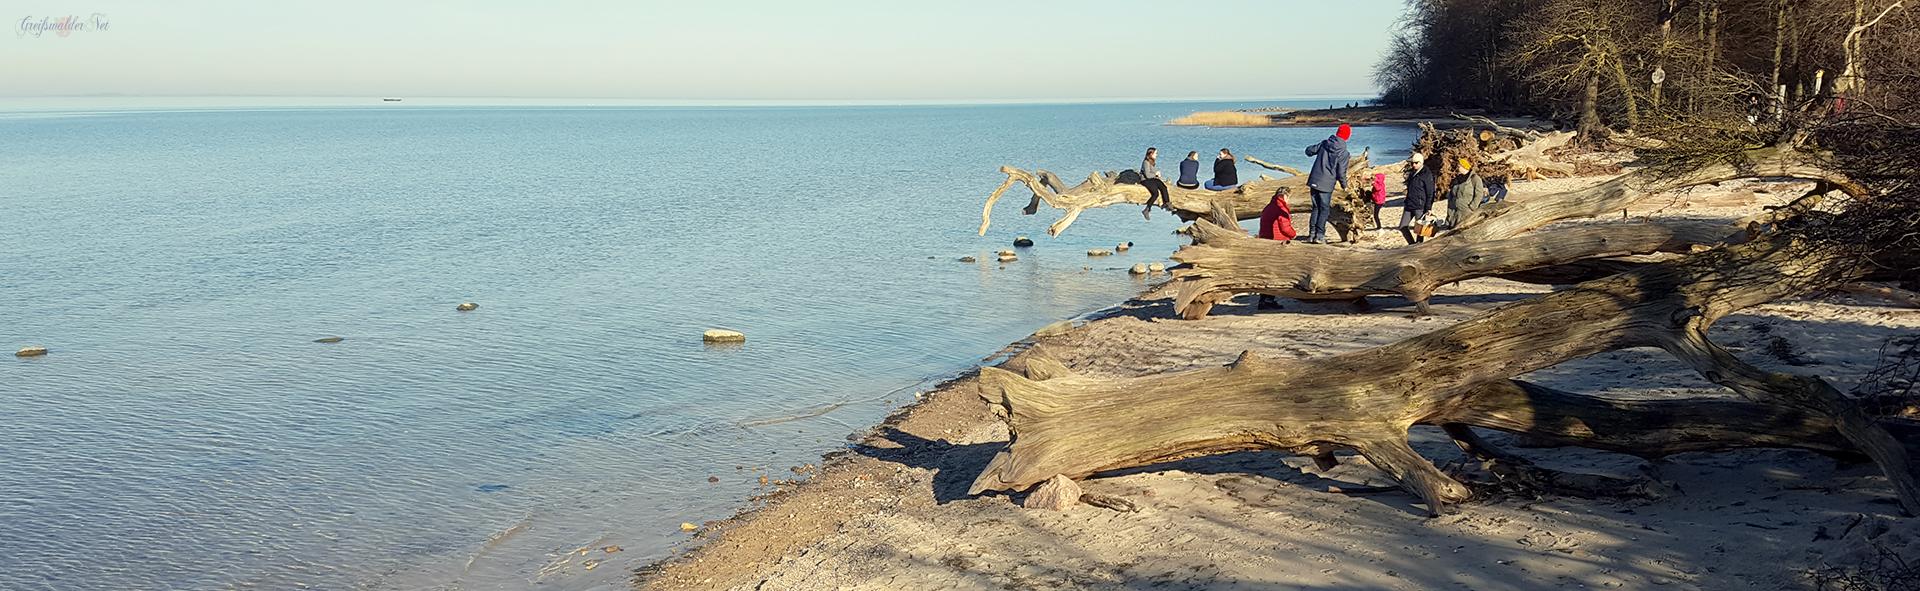 Beliebtes Ausflugsziel - Schlafende Bäume am Strand bei Loissin